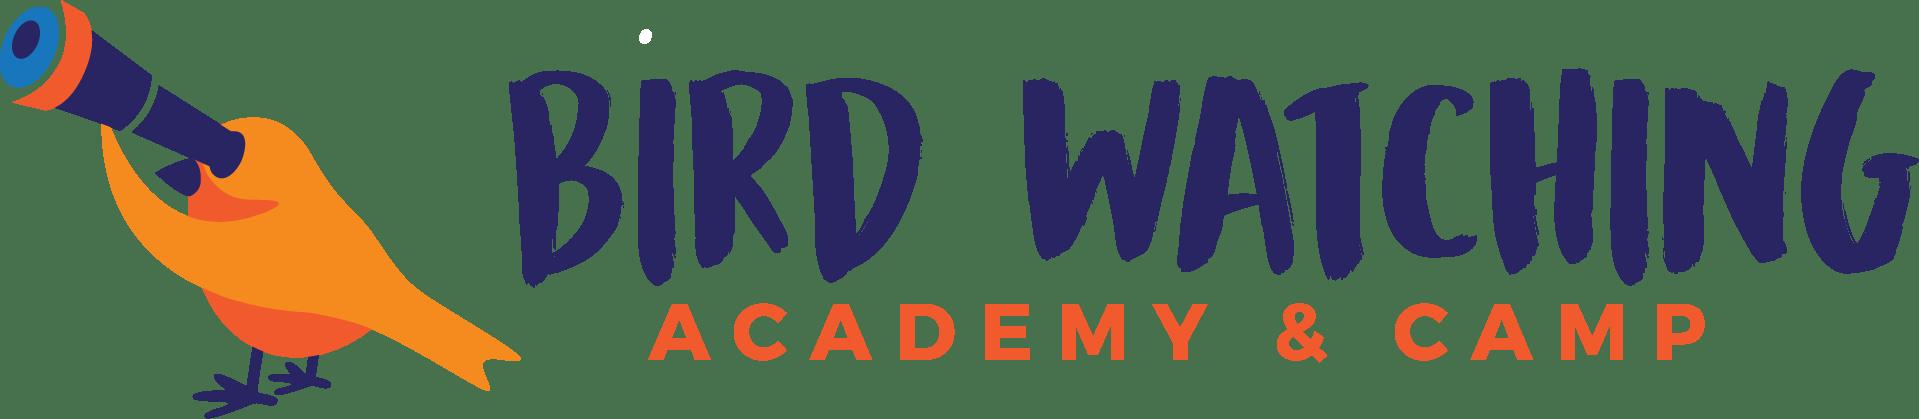 Bird Watching Academy